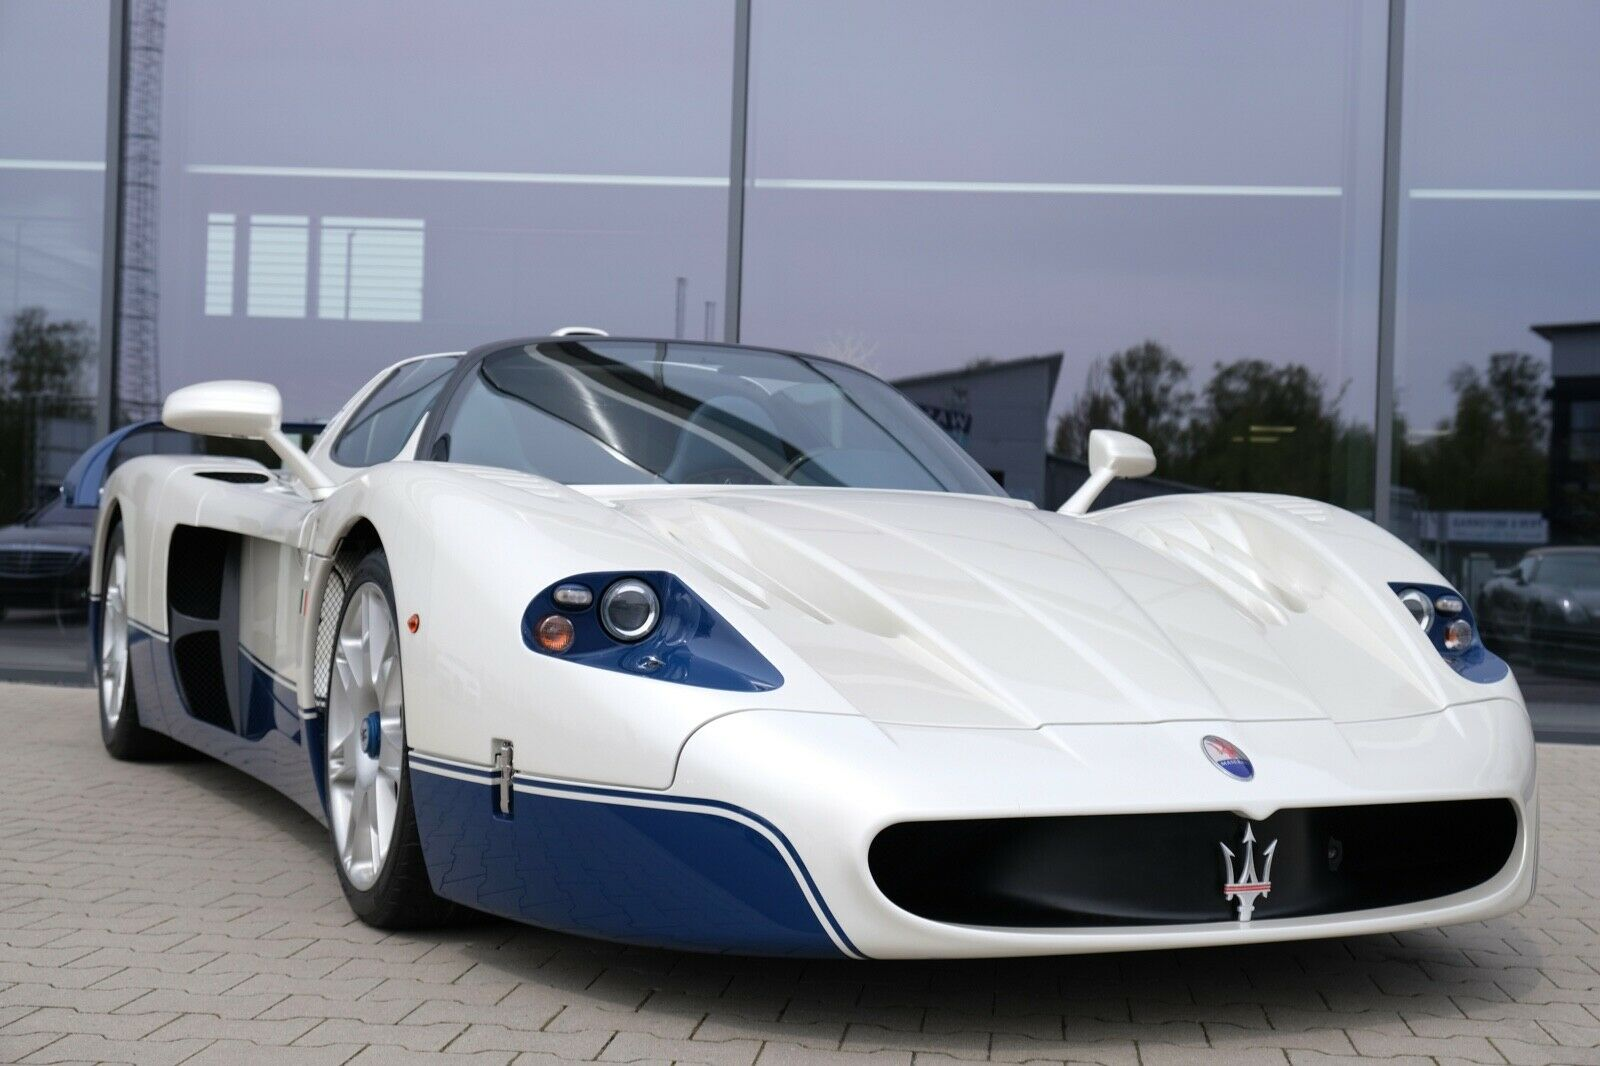 2006 Maserati MC12 For Sale – 1 of 50 Worldwide